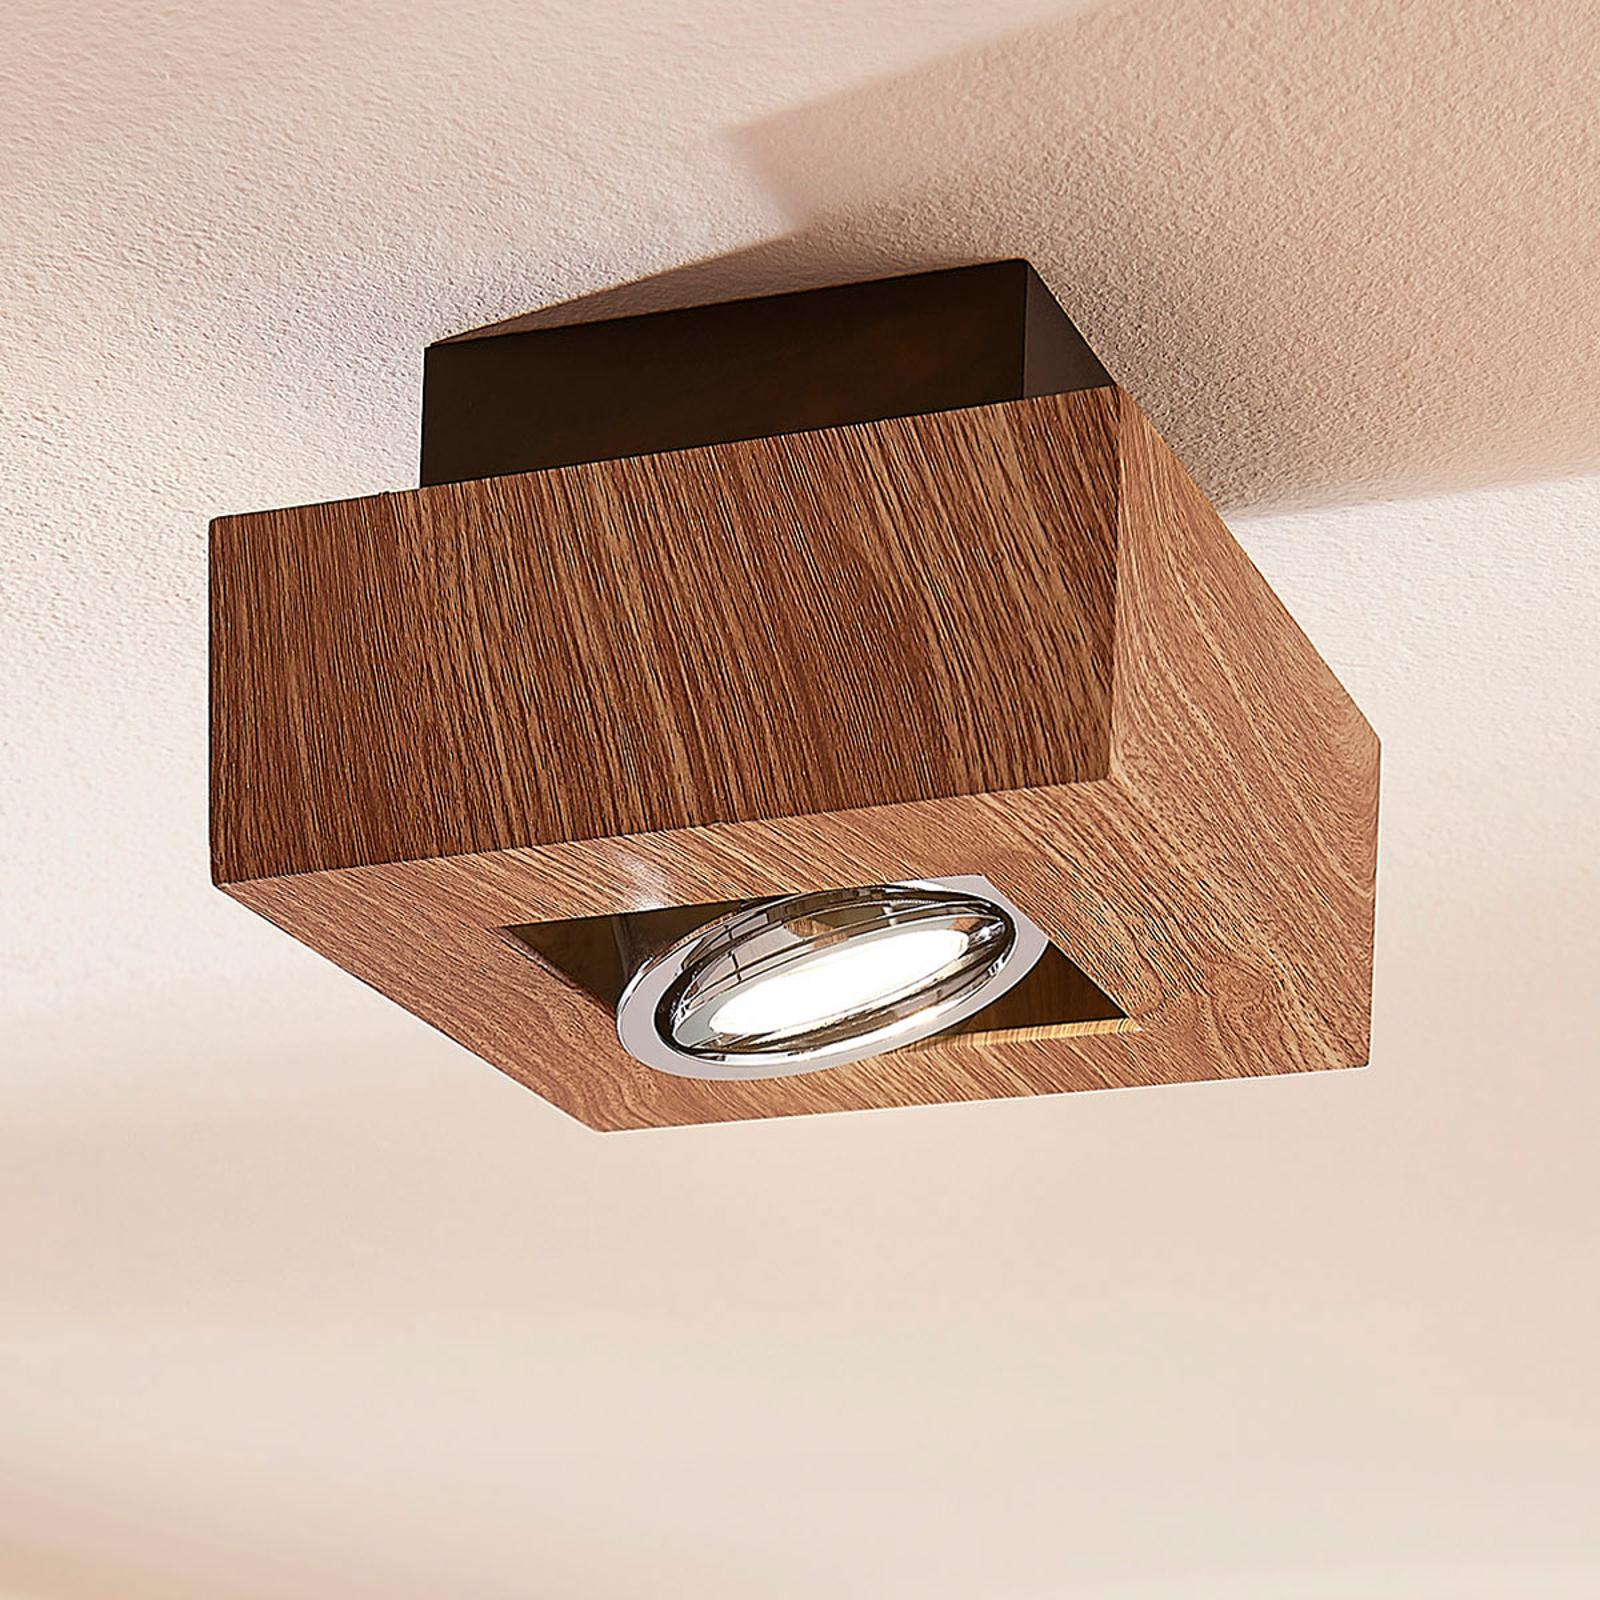 LED-Deckenleuchte Vince, 14x14cm in Holzoptik